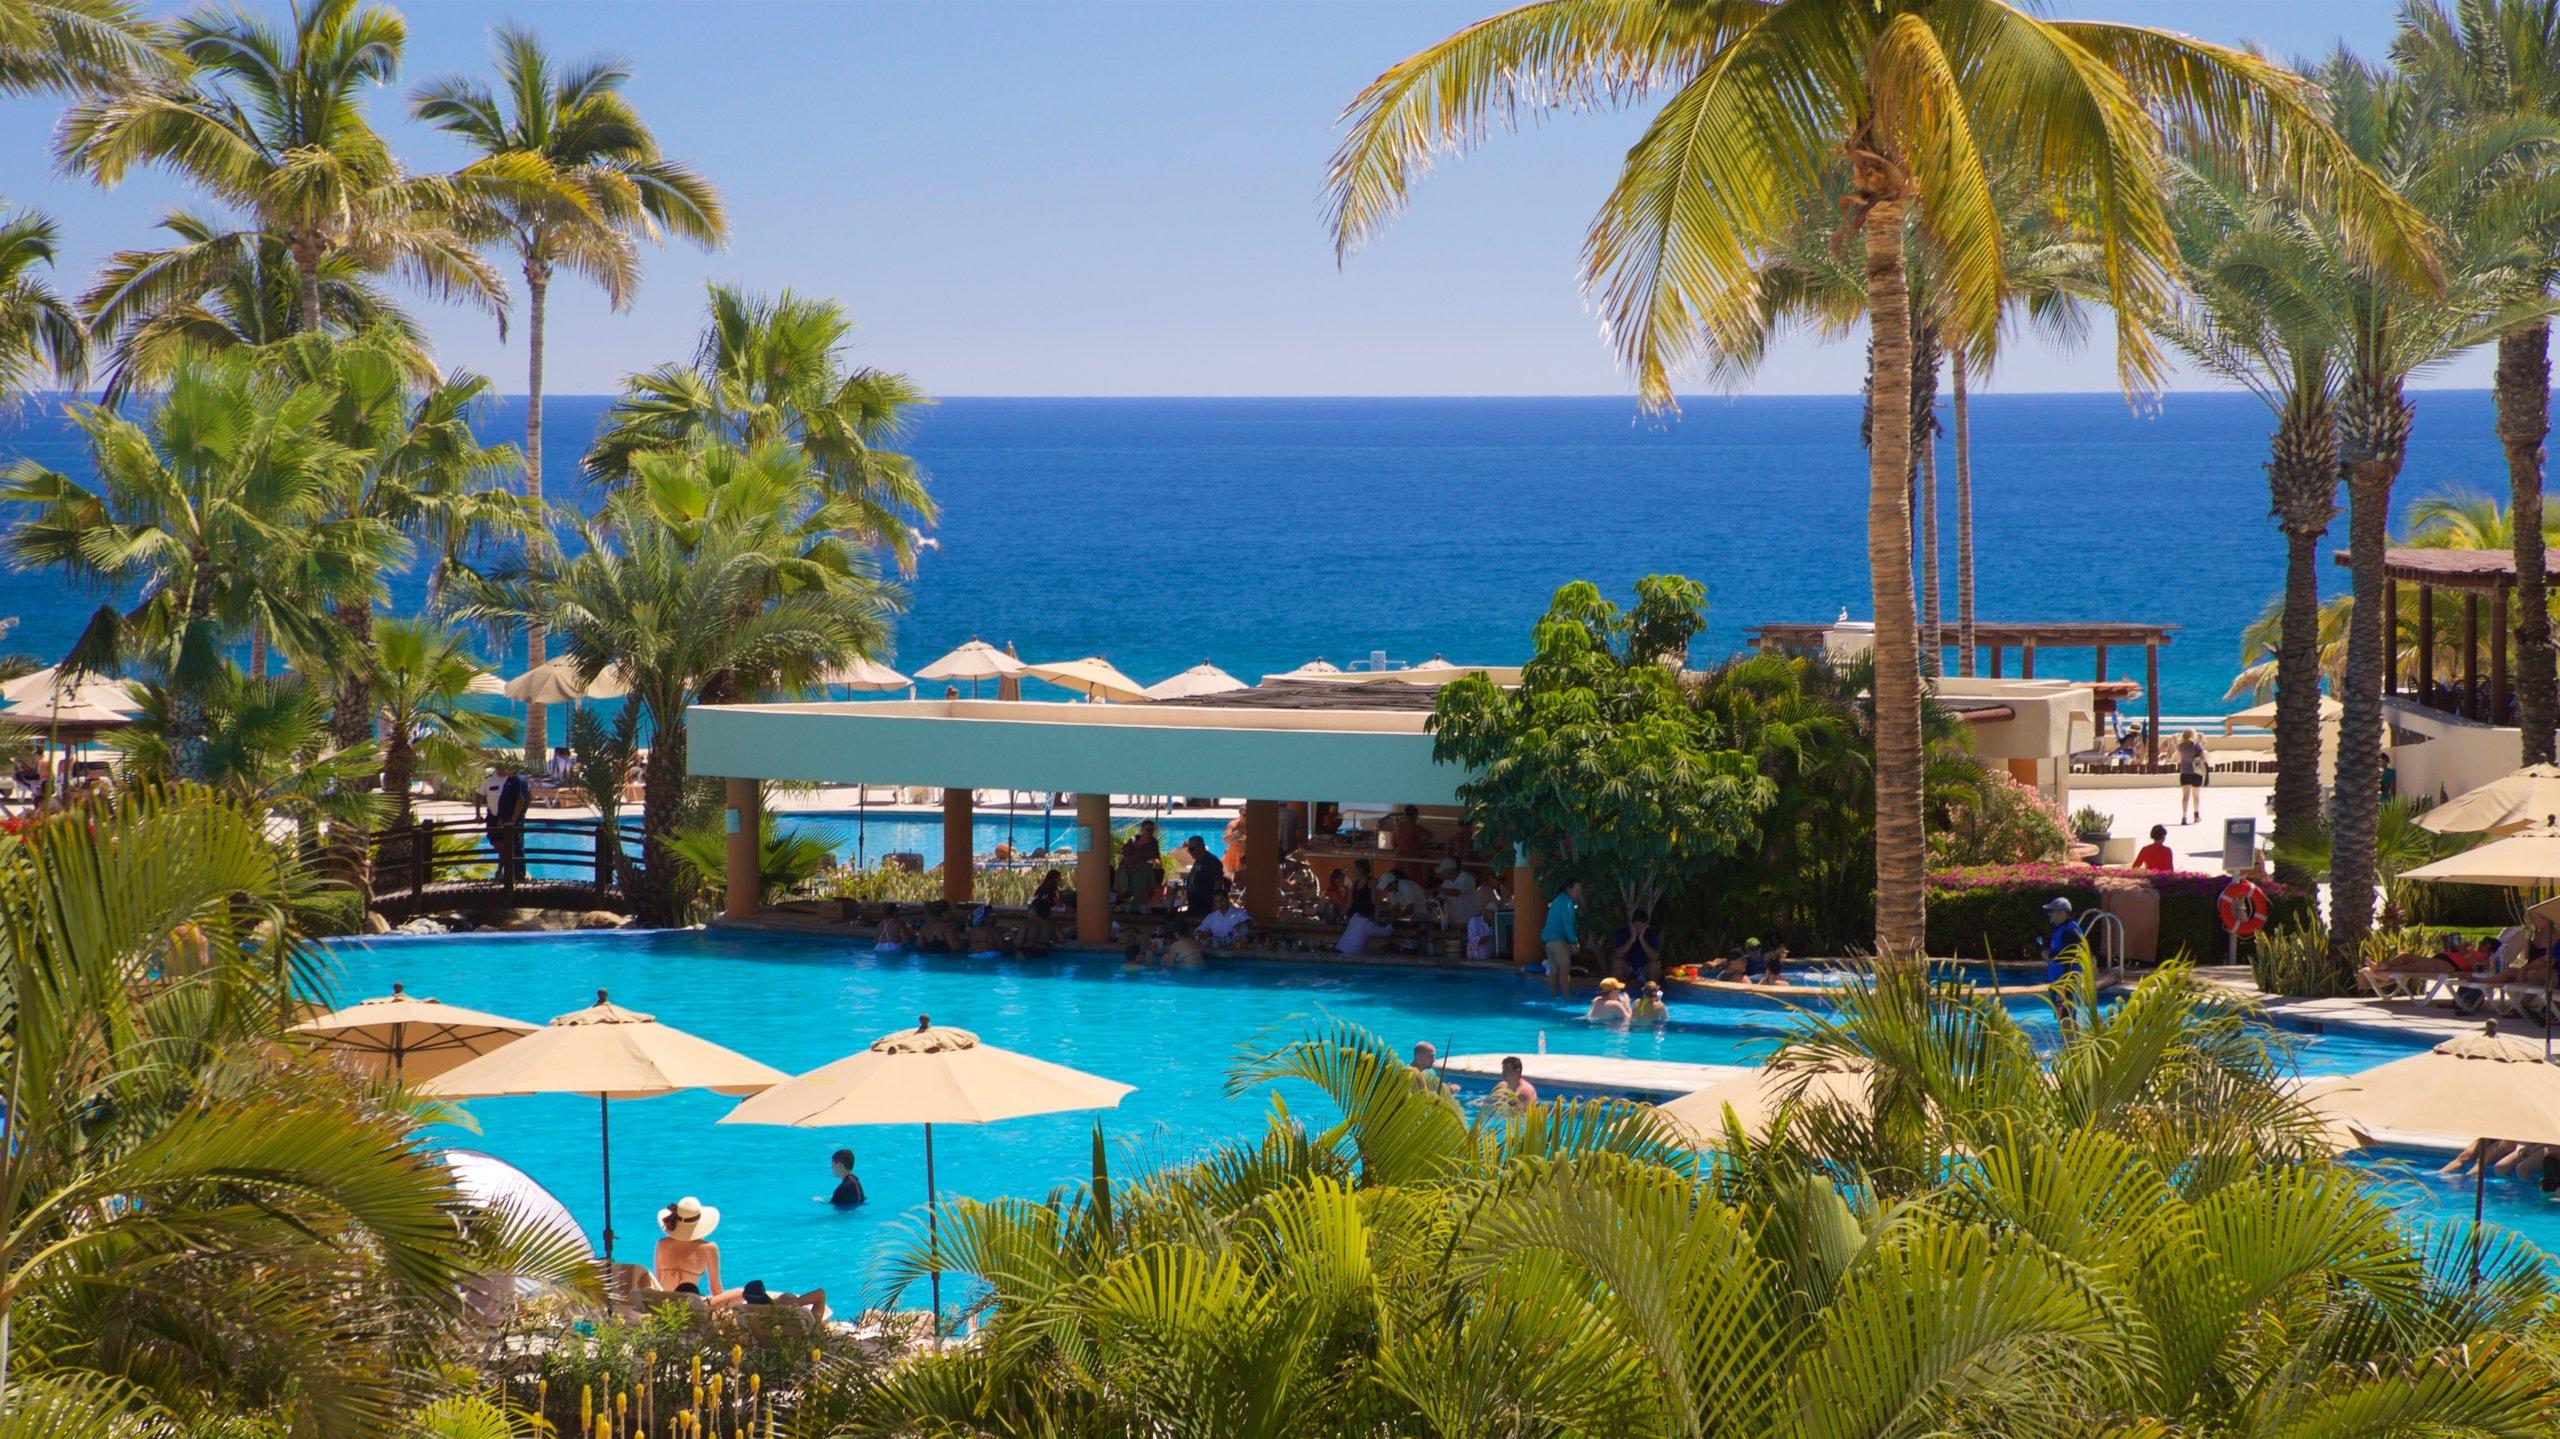 Zona Hotelera, San Jose del Cabo, Baja California Sur, Mexico